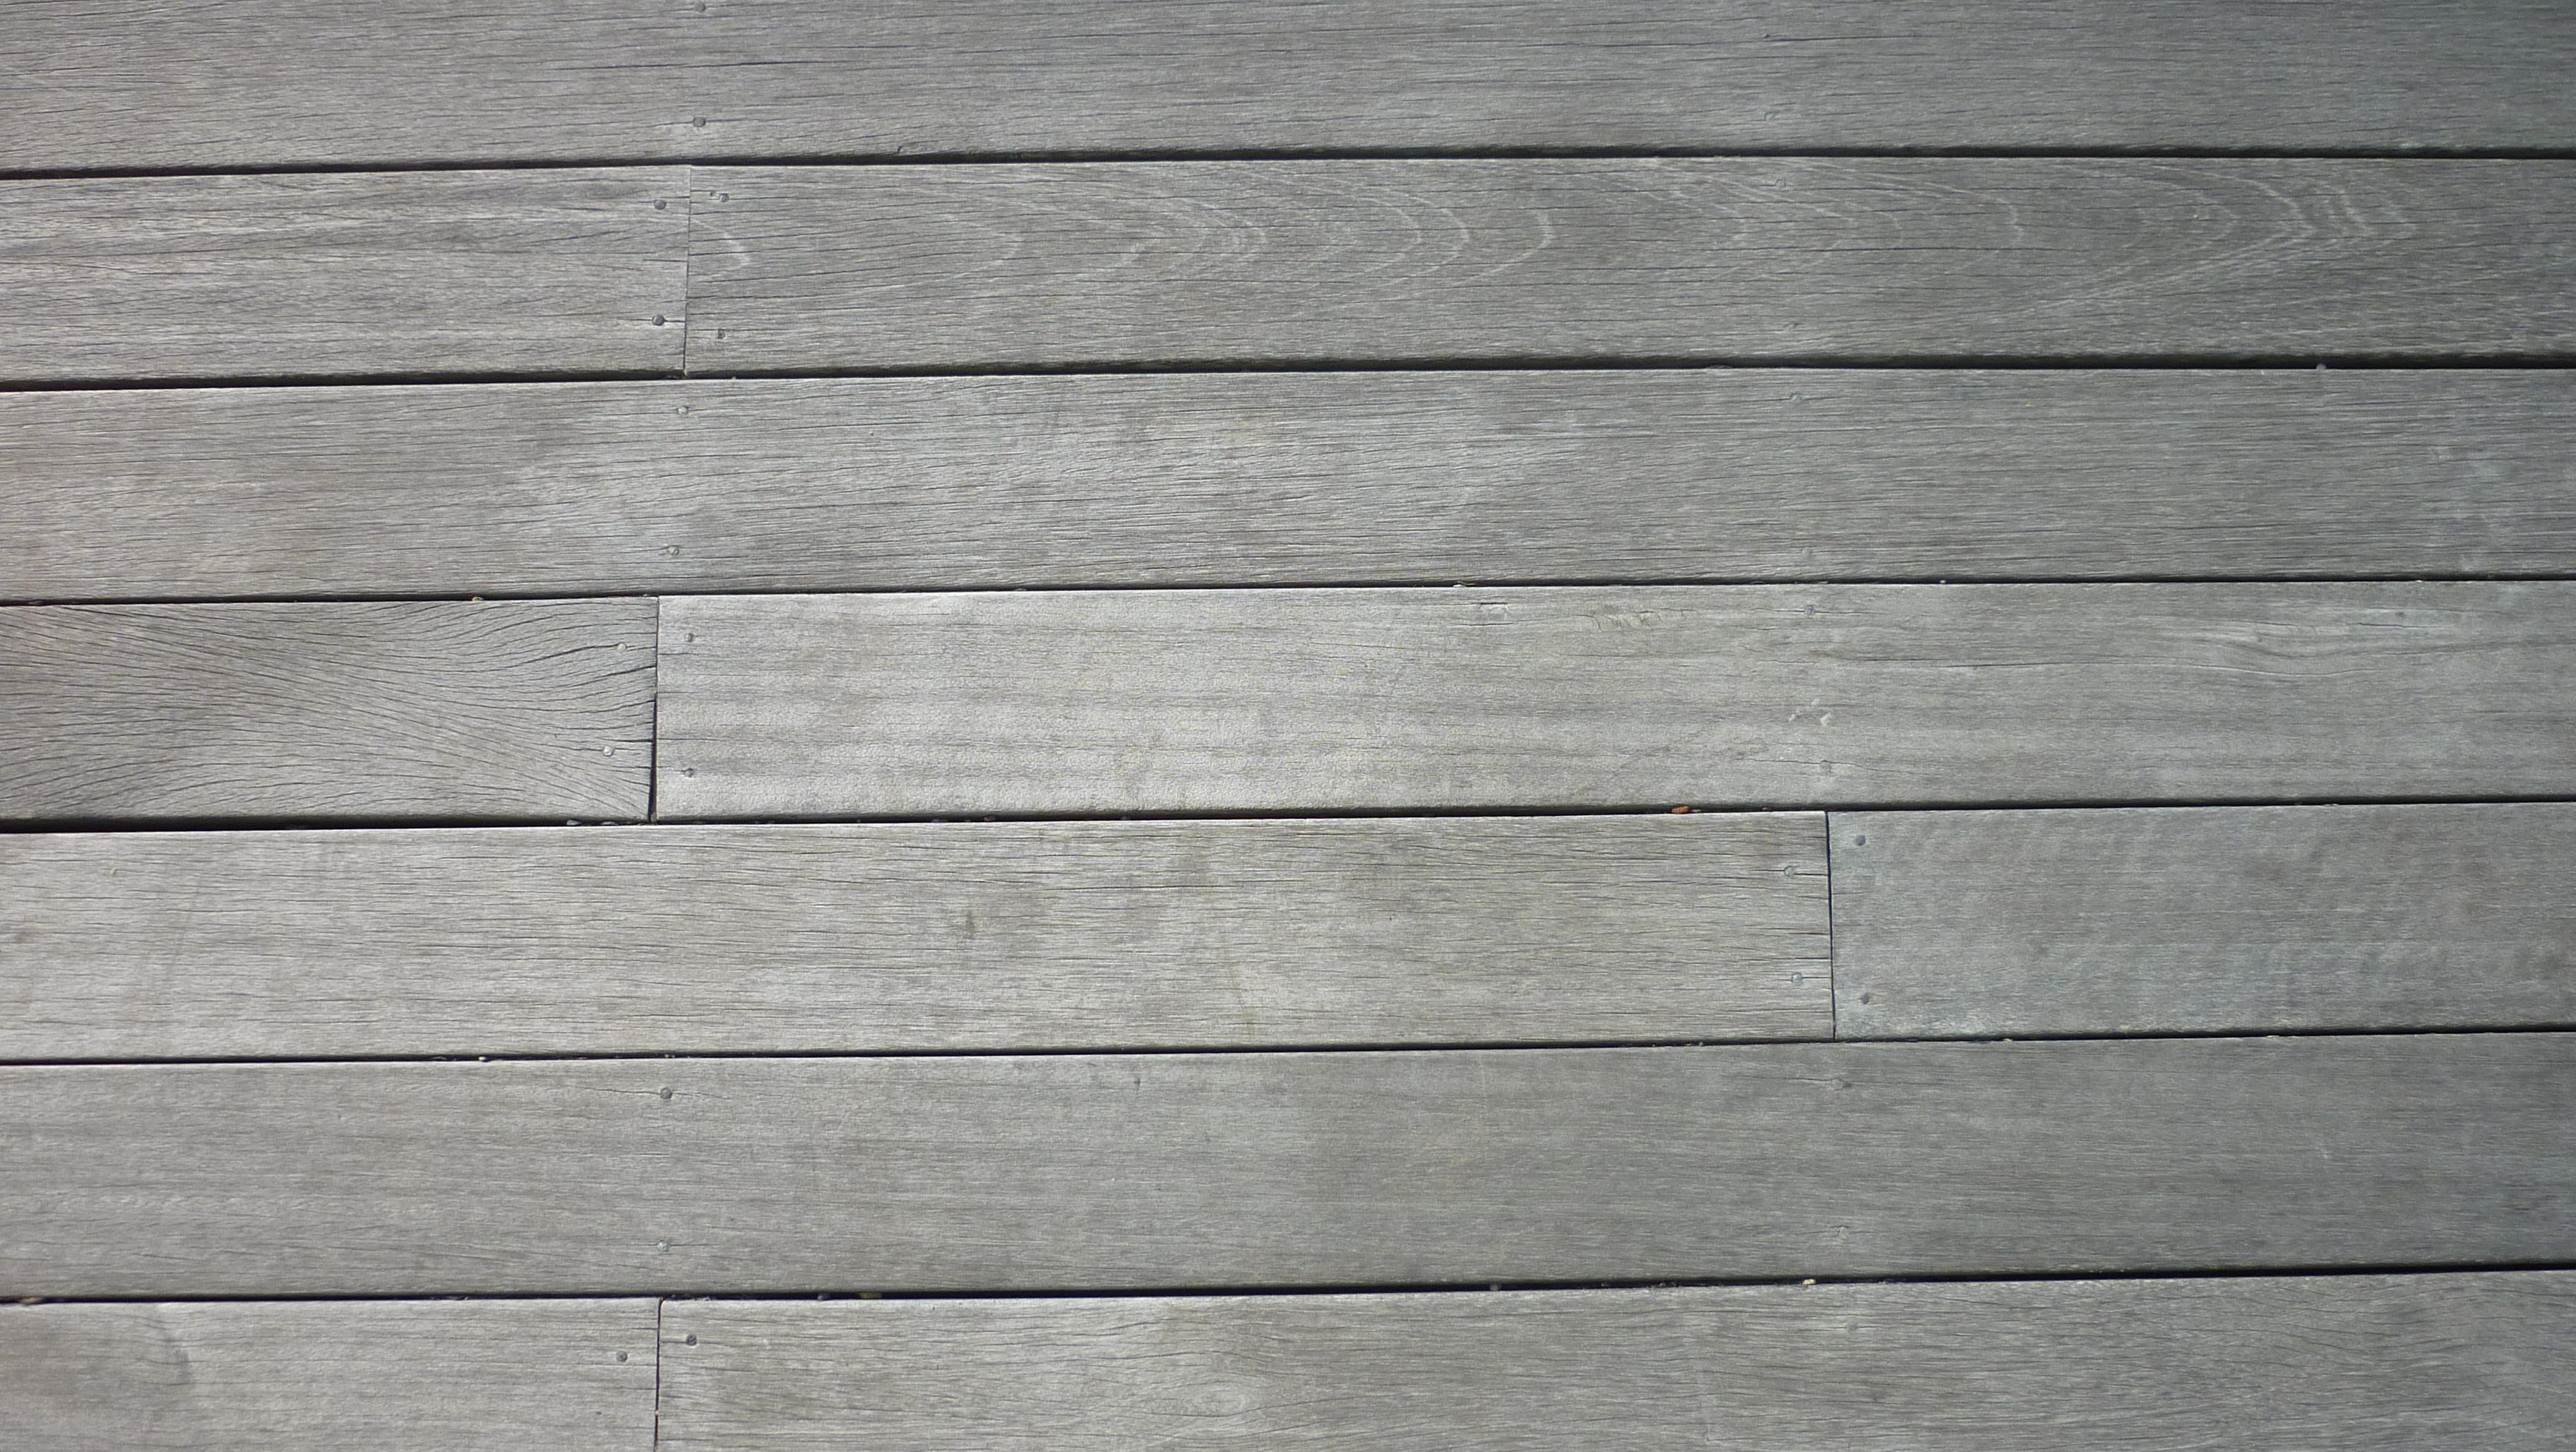 Wood Deck, Deck, Dry, Texture, Wood, HQ Photo